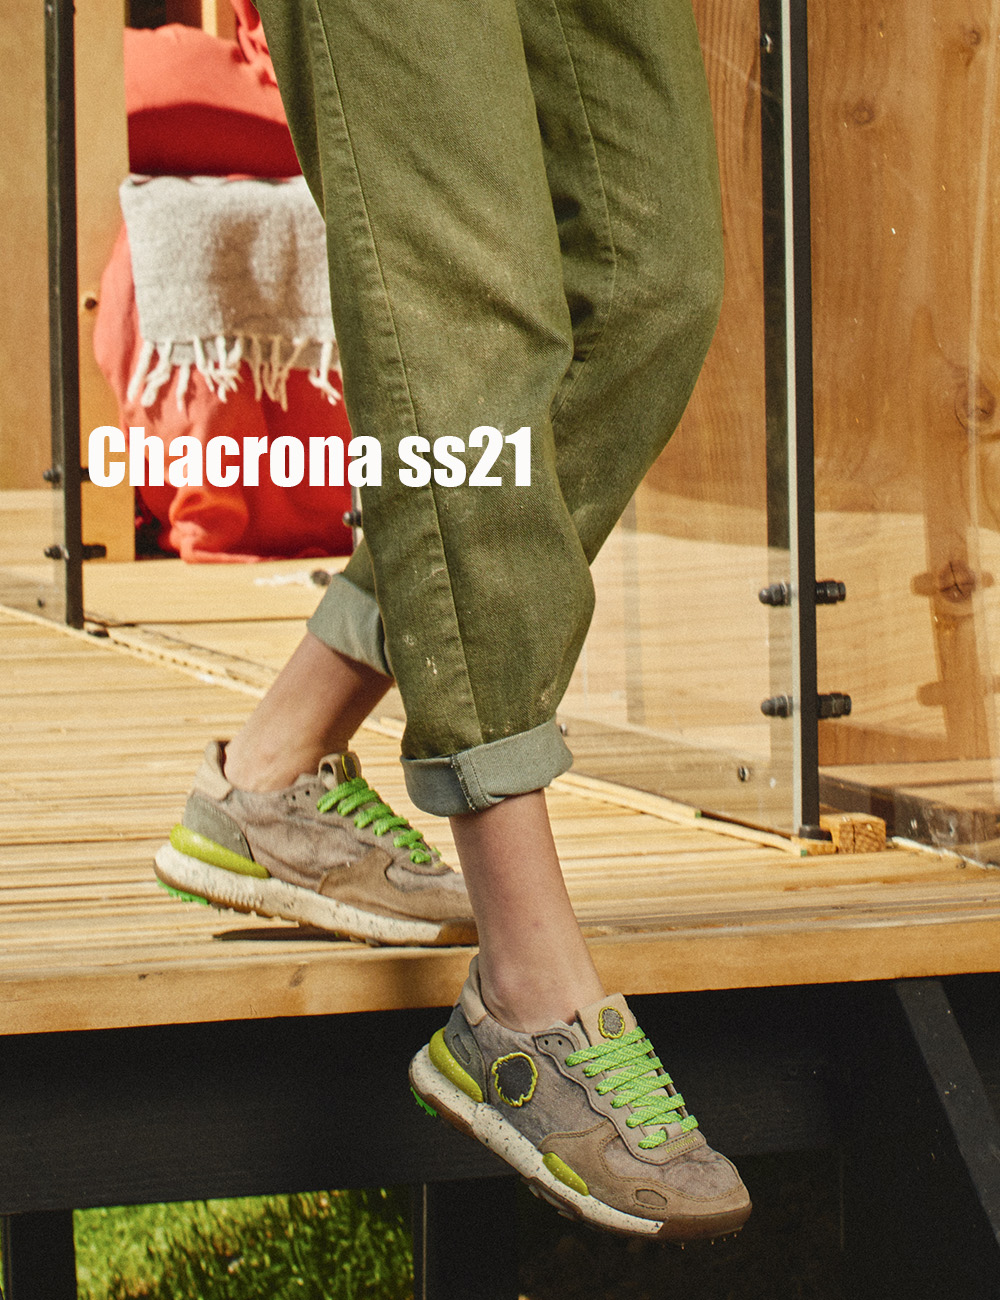 Chacrona green